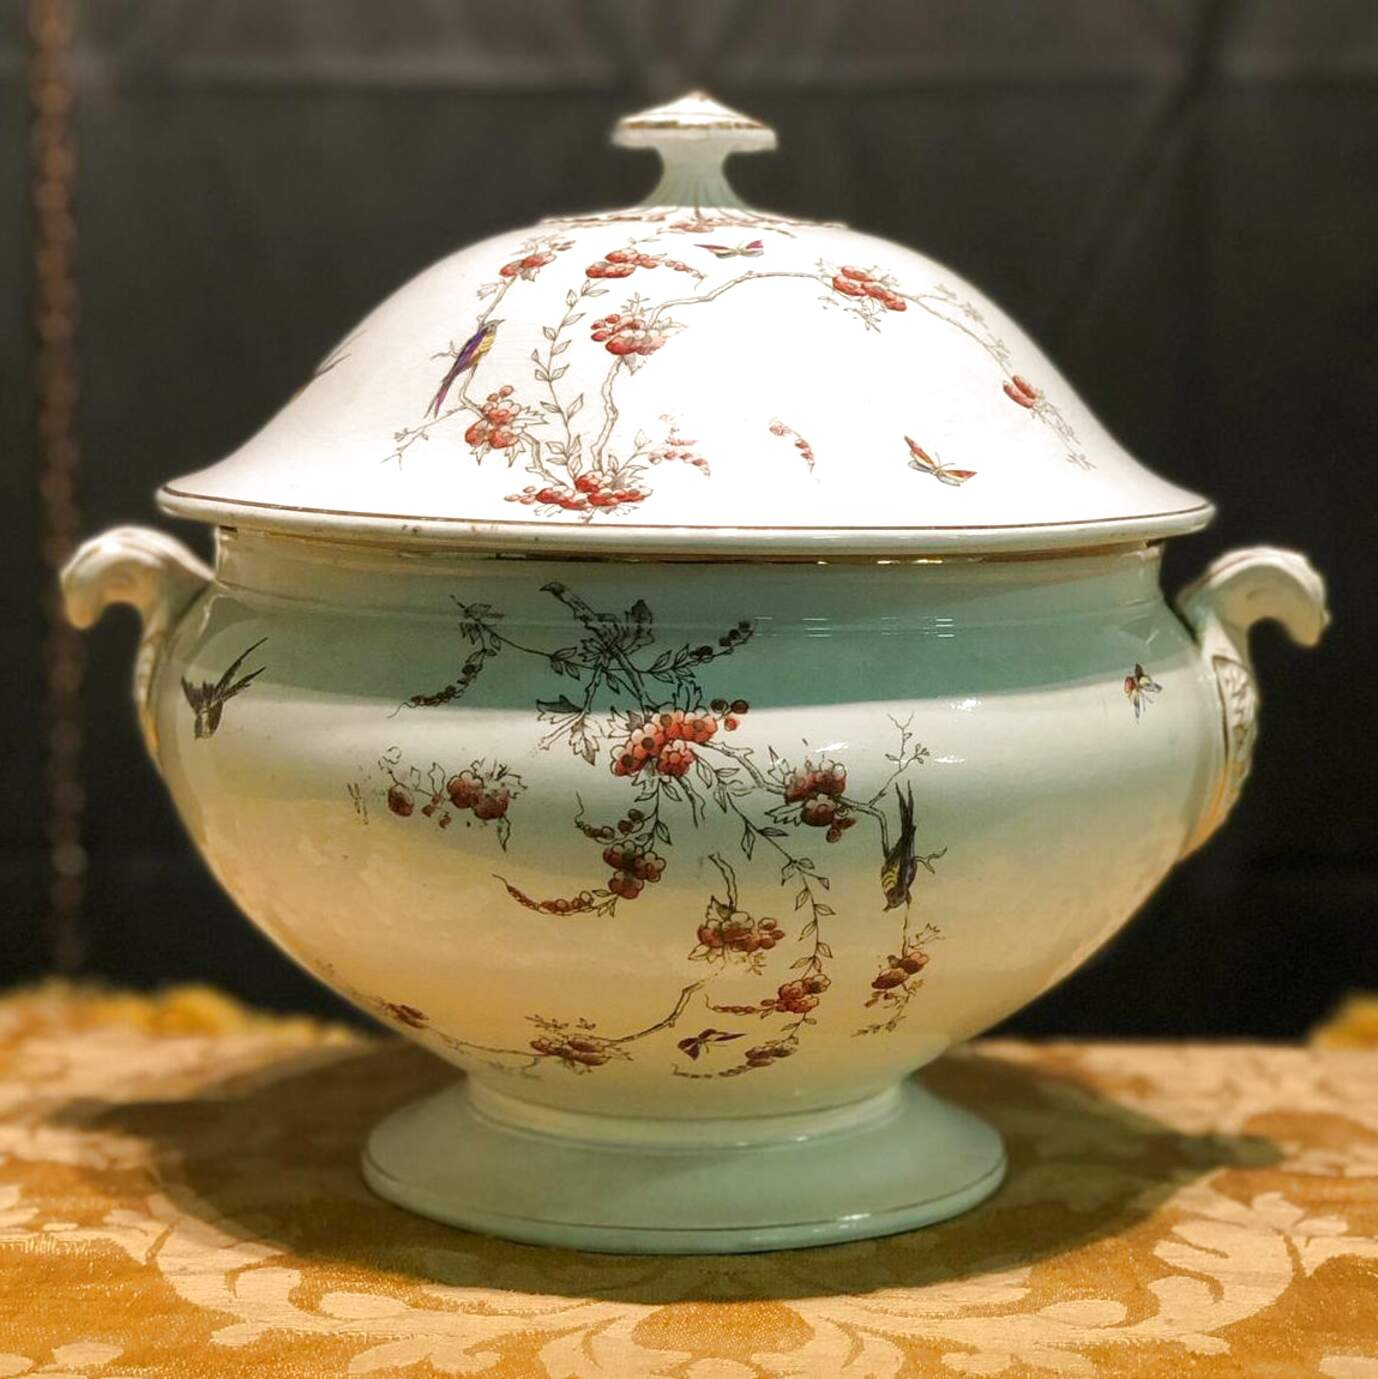 zuppiera richard antica usato